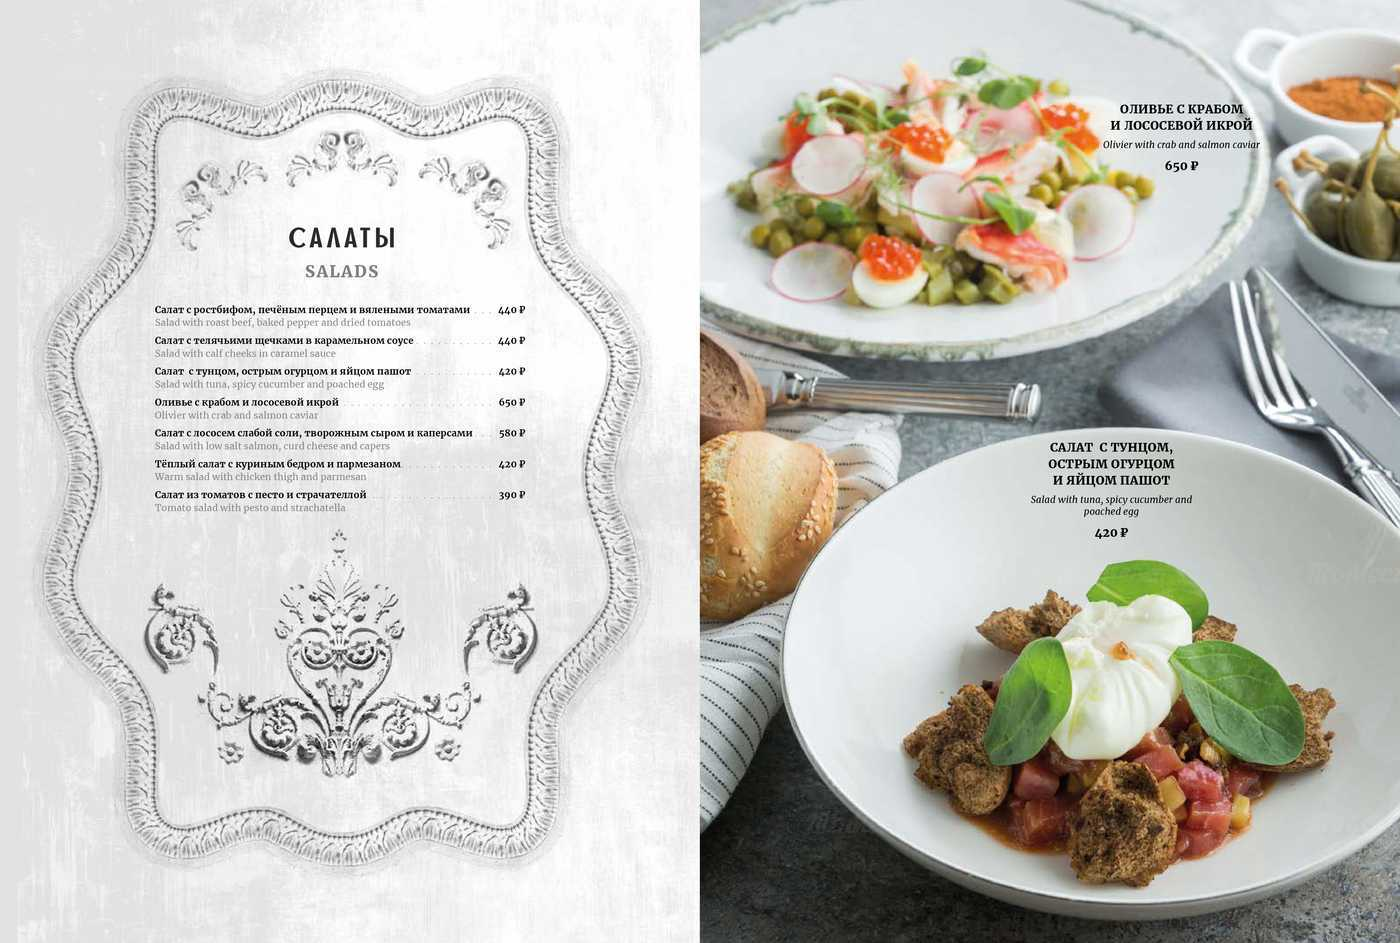 Меню ресторана Шато Винтаж (Chateau Vintage) на Невском проспекте фото 3